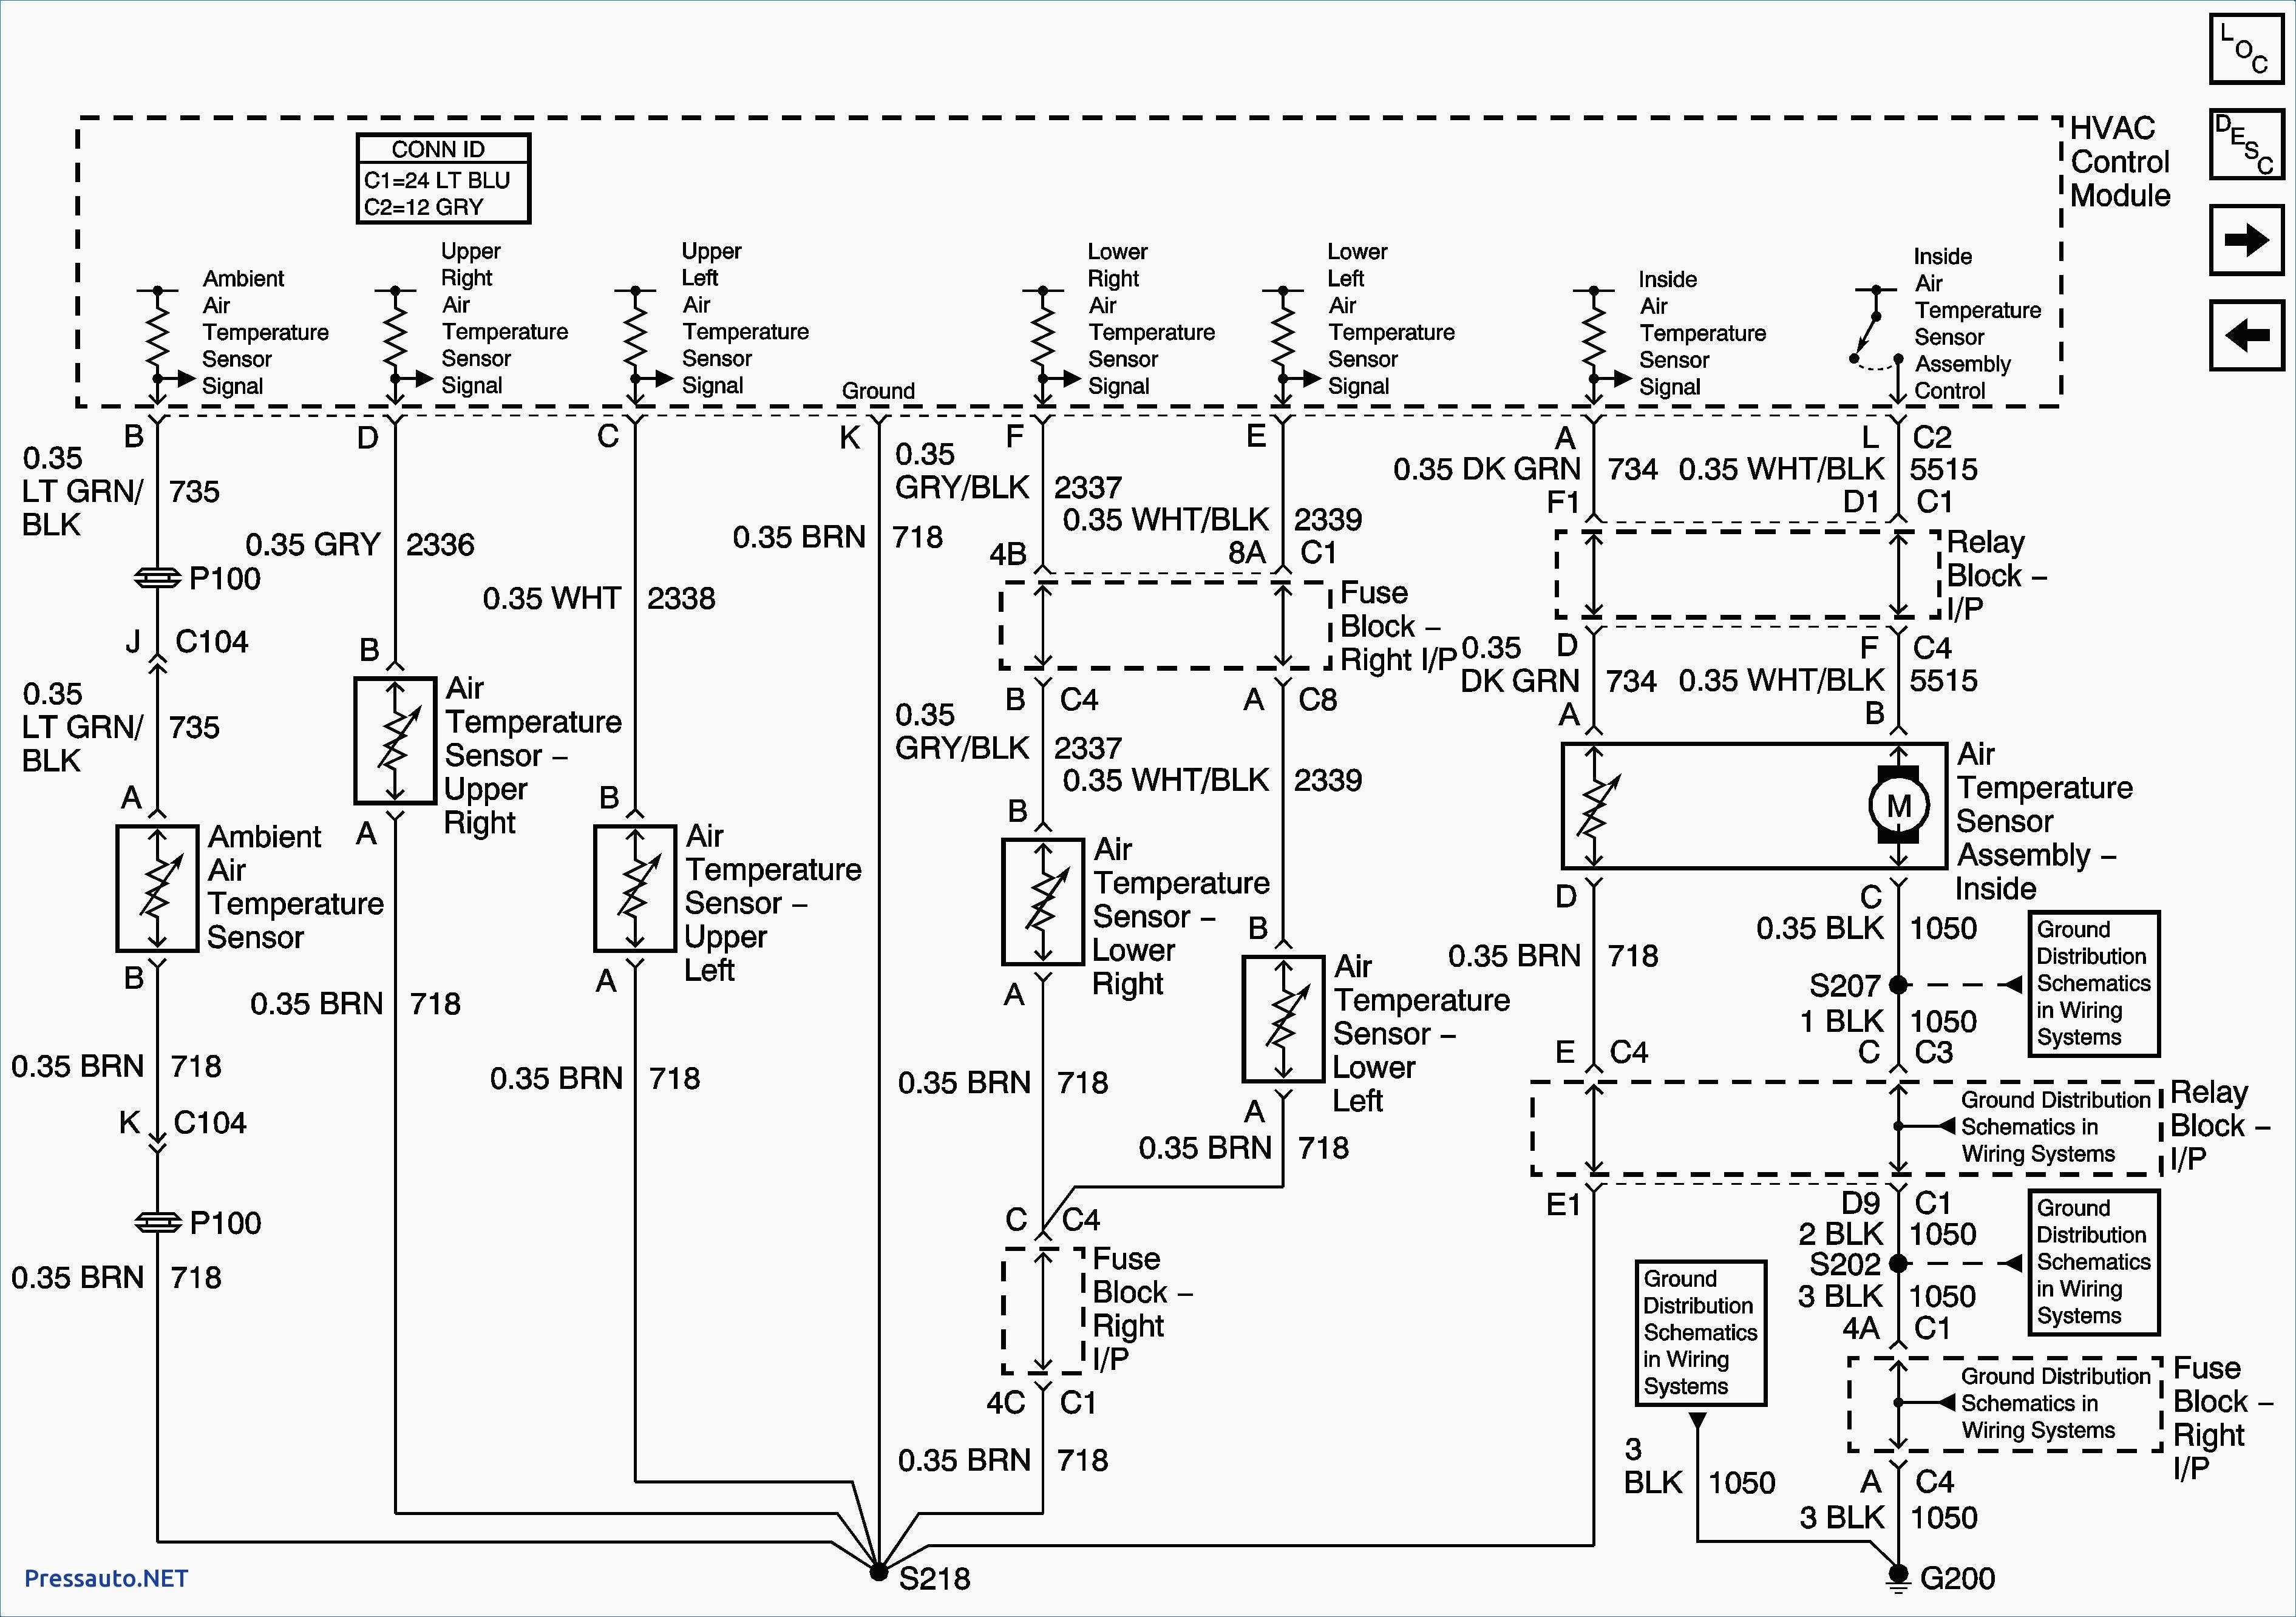 Wiring Diagram 2003 Suburban | Wiring Library - 2004 Chevy Tahoe Radio Wiring Diagram